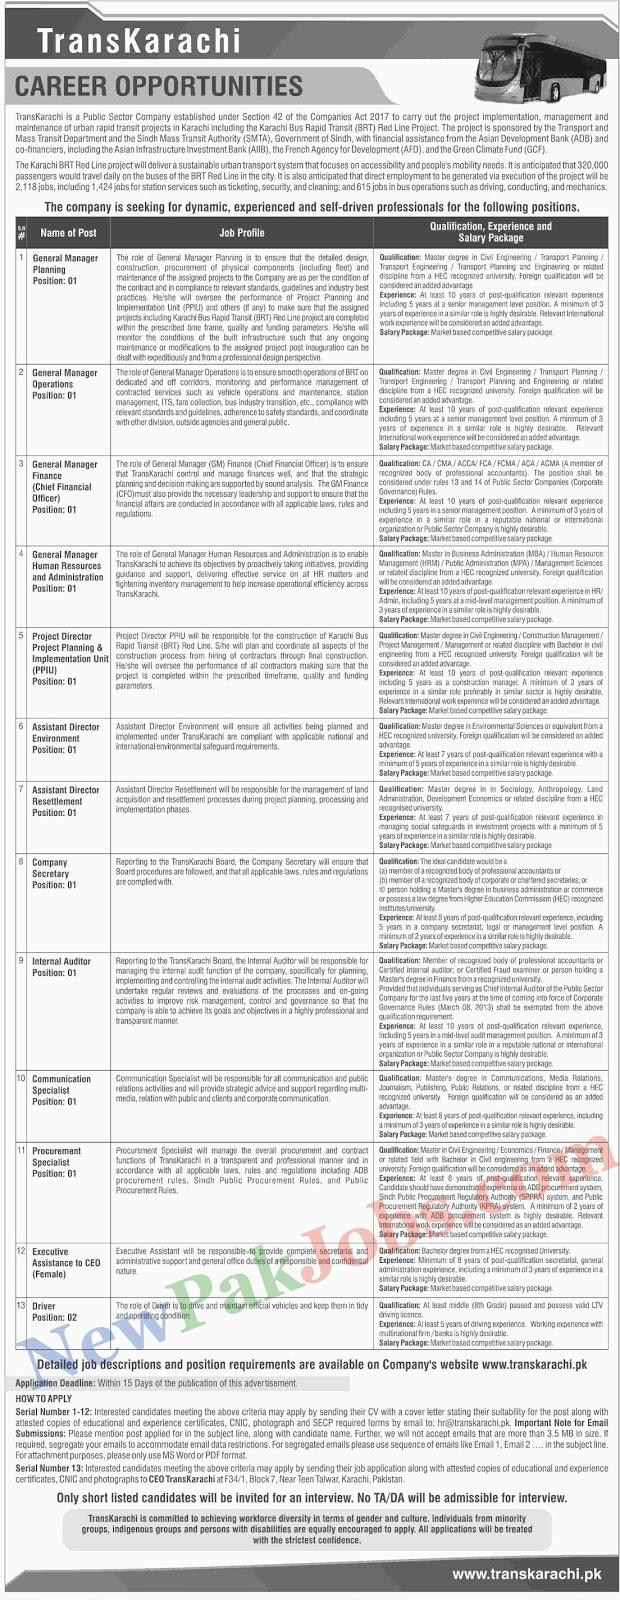 Trans Karachi Latest Jobs 14 April 2019